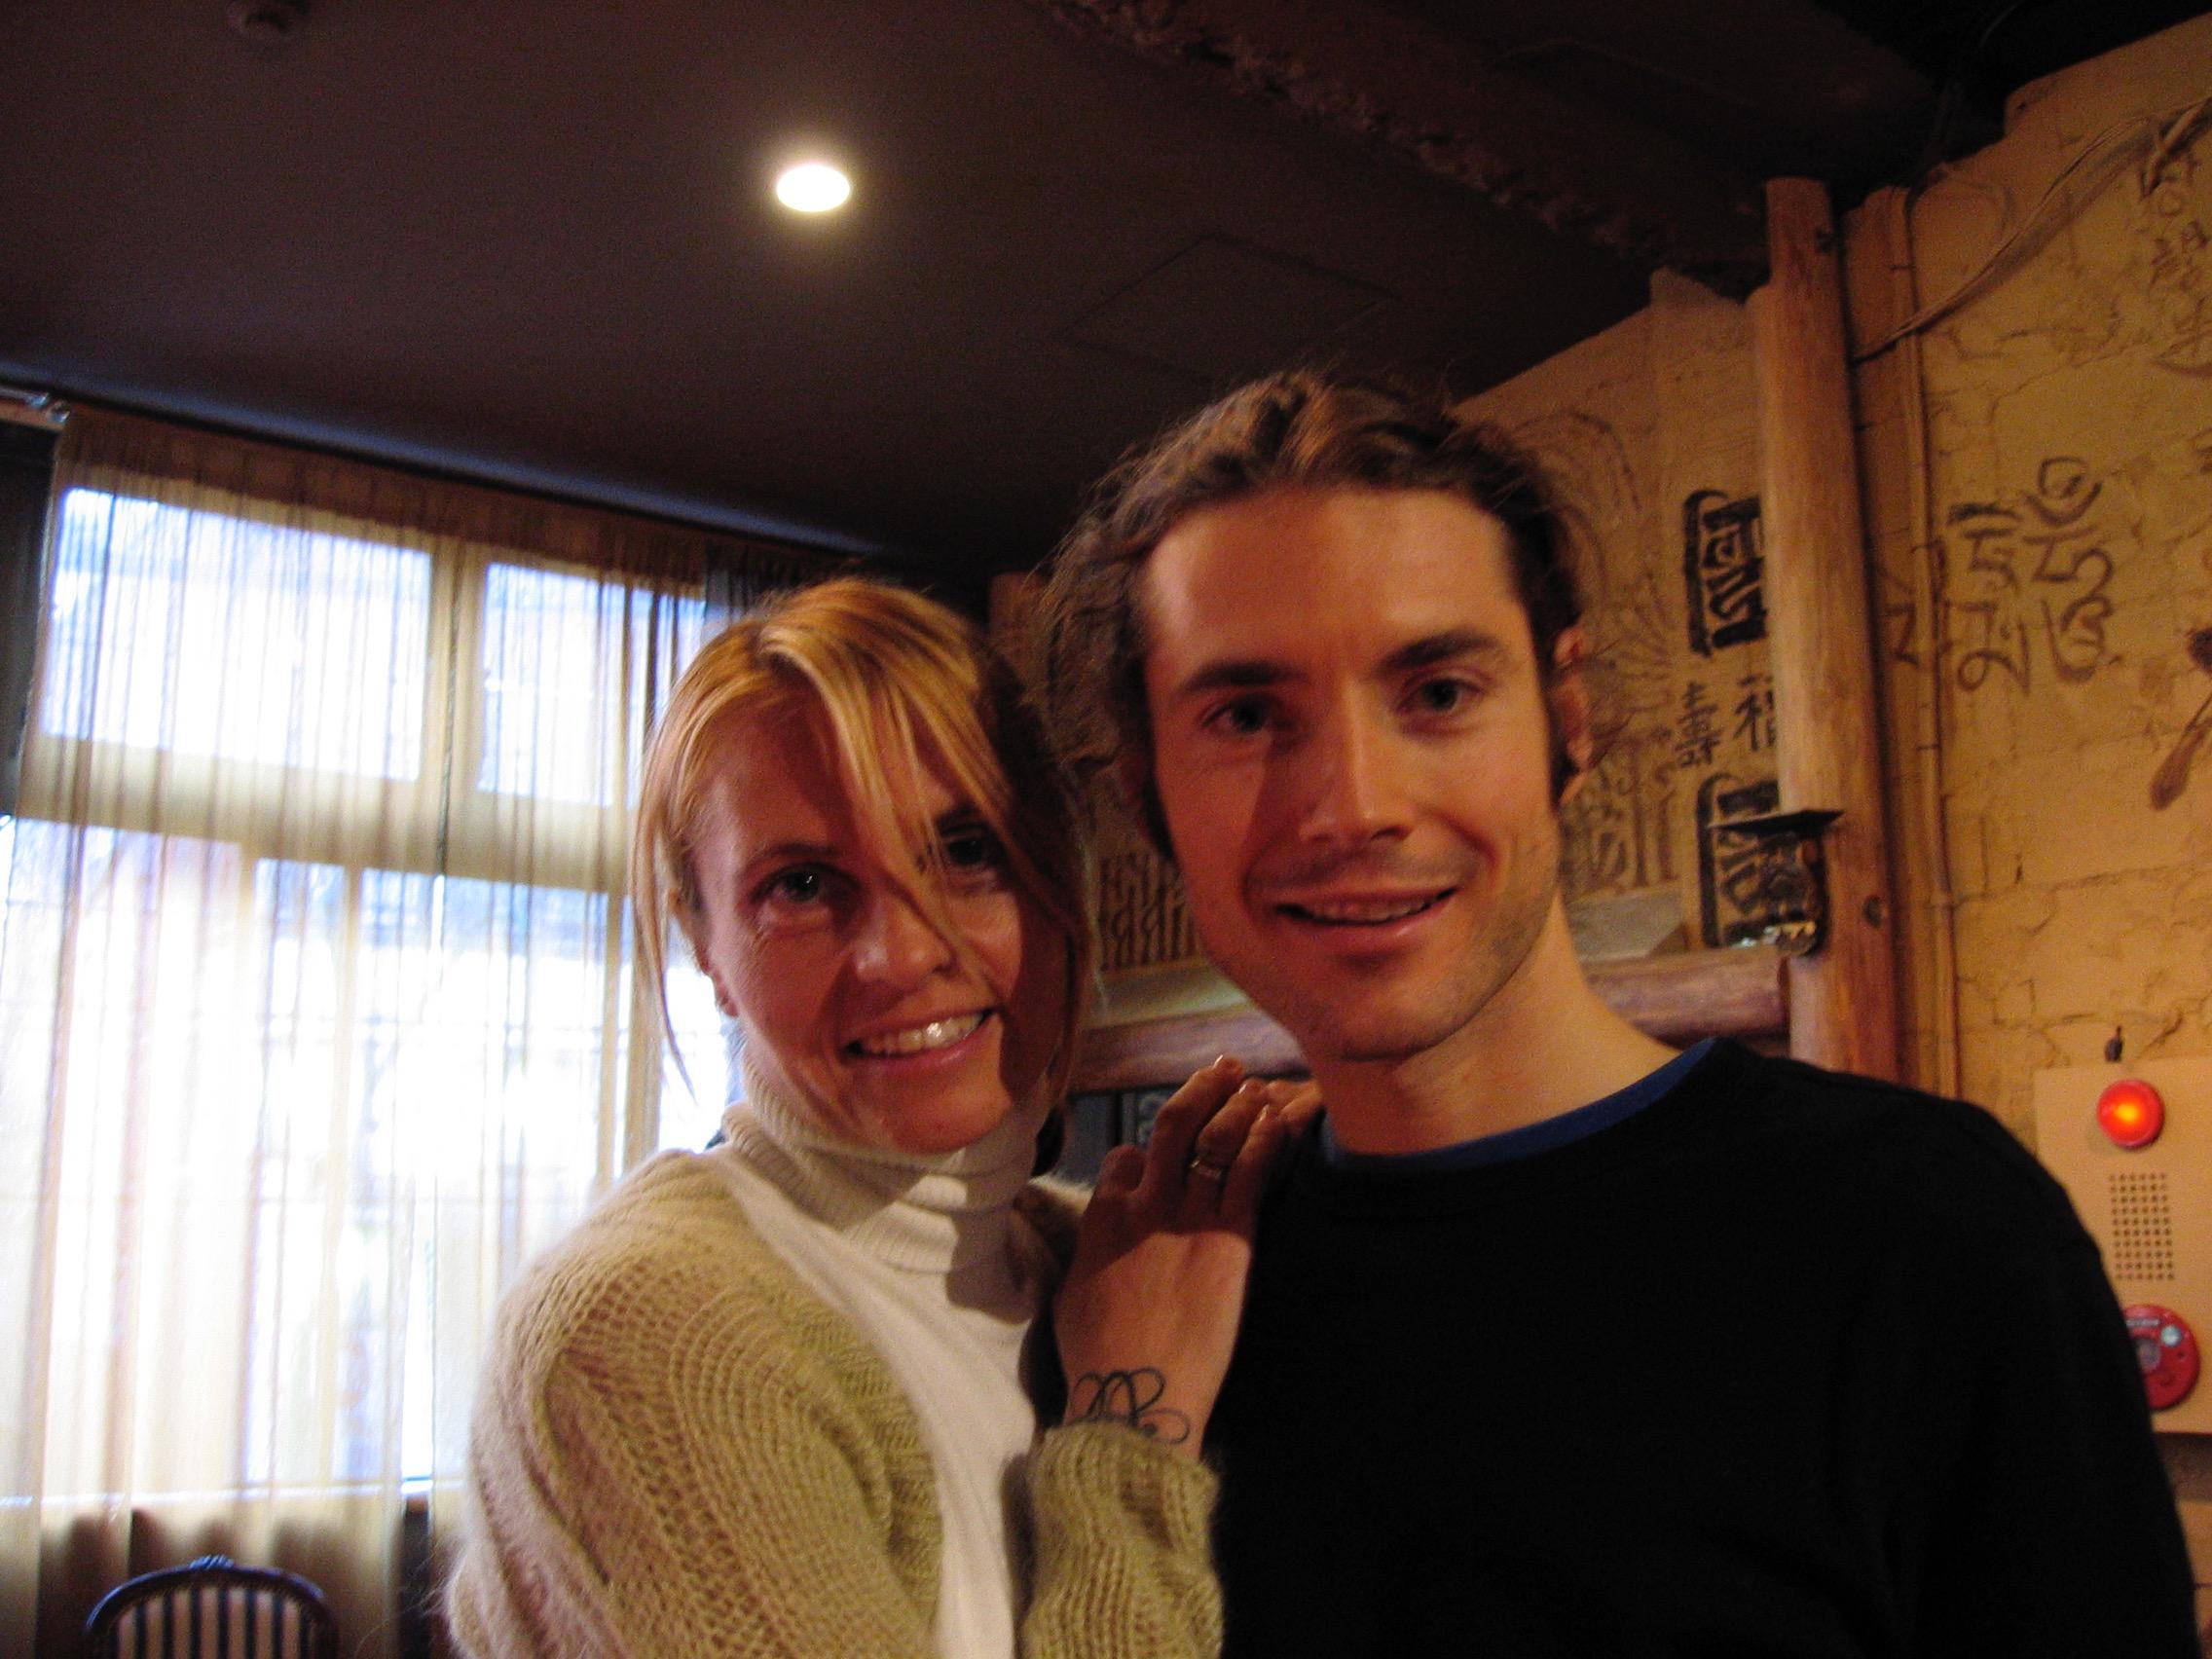 with Basia Lipska